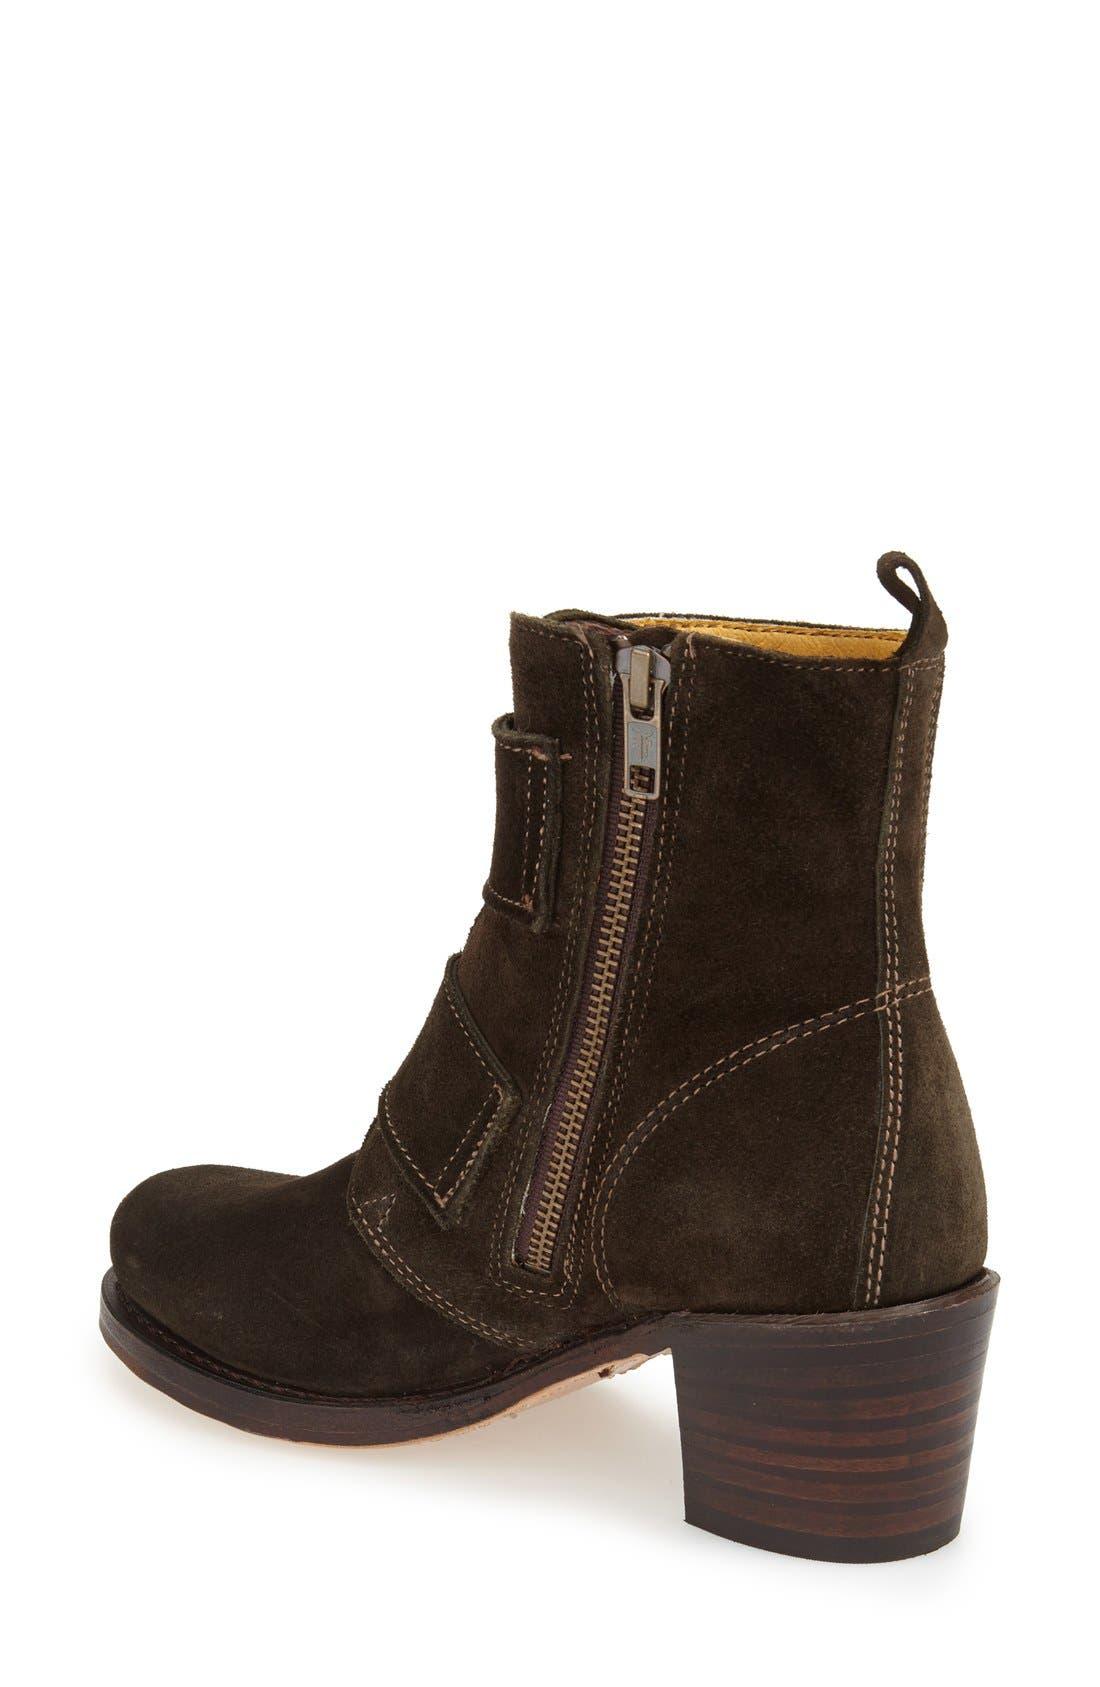 Alternate Image 2  - Frye 'Sabrina' Double Buckle Boot (Women)